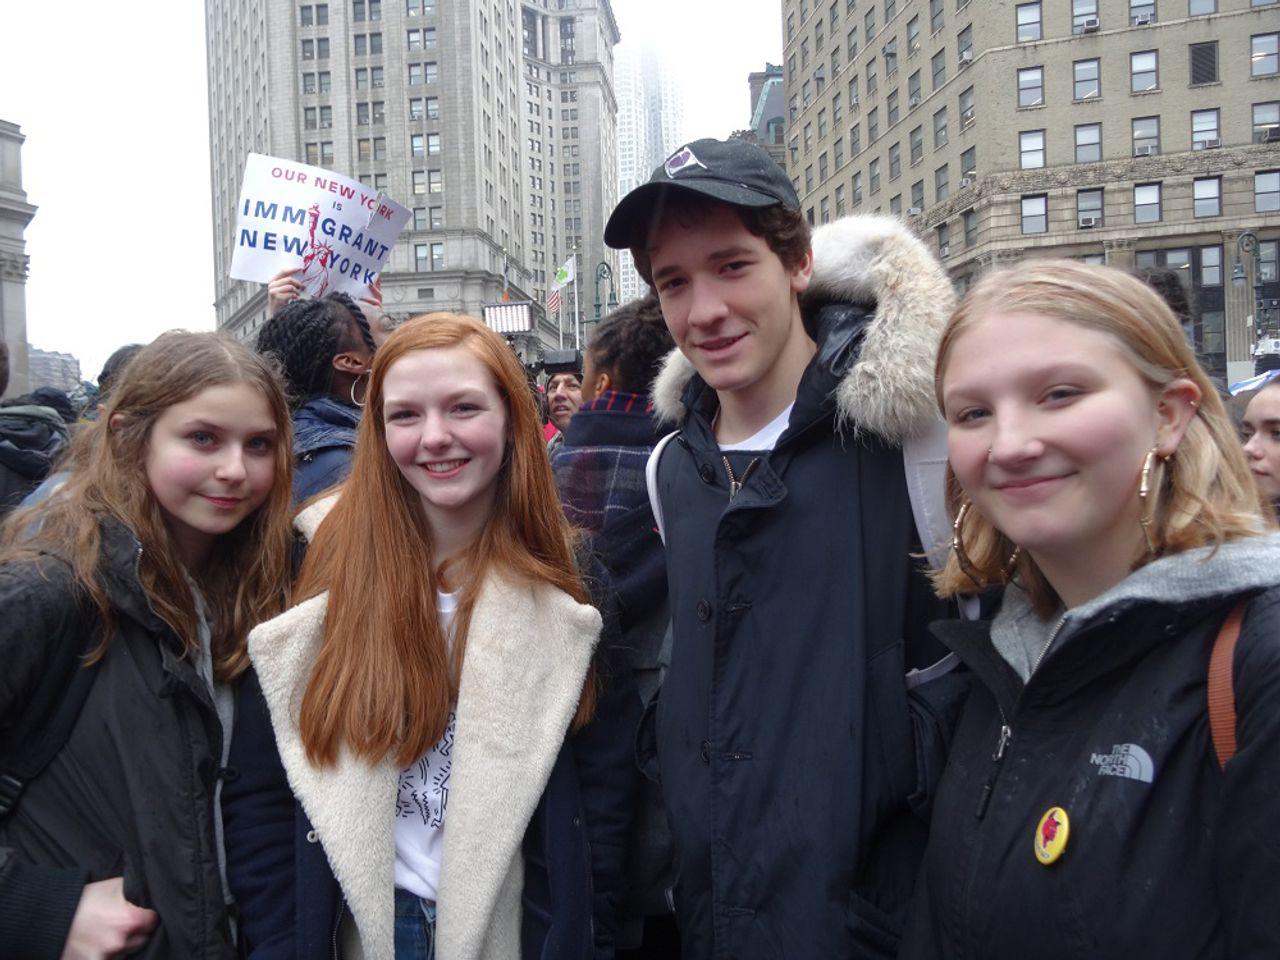 Lucca, Eibhilin, Ben and Phoebe